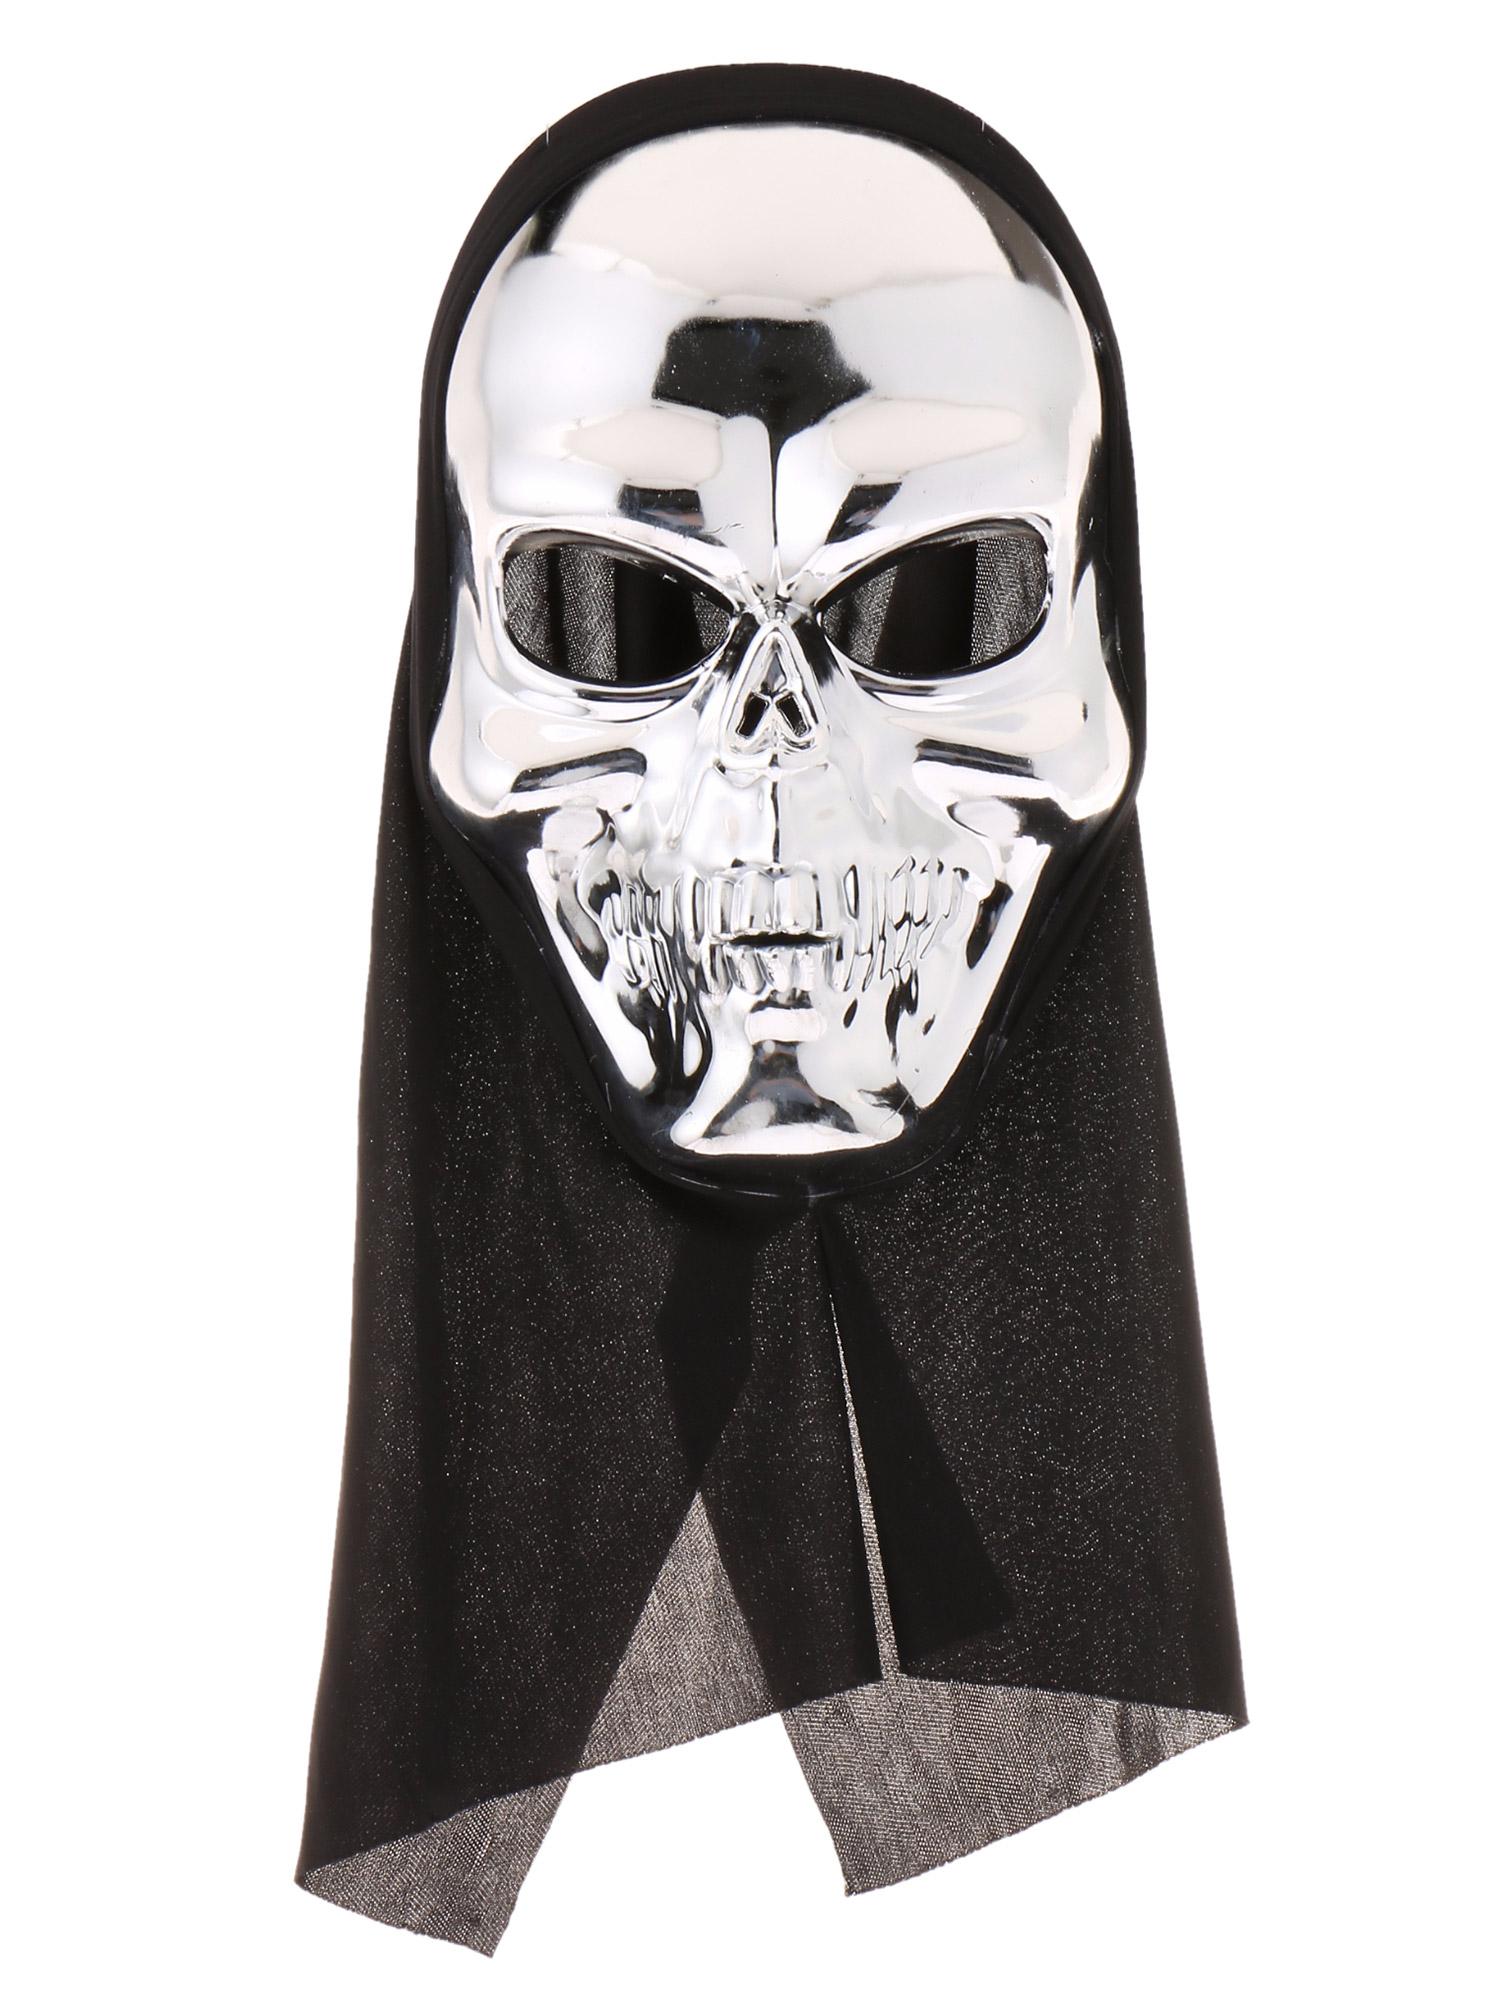 WEGO/メタルマスク